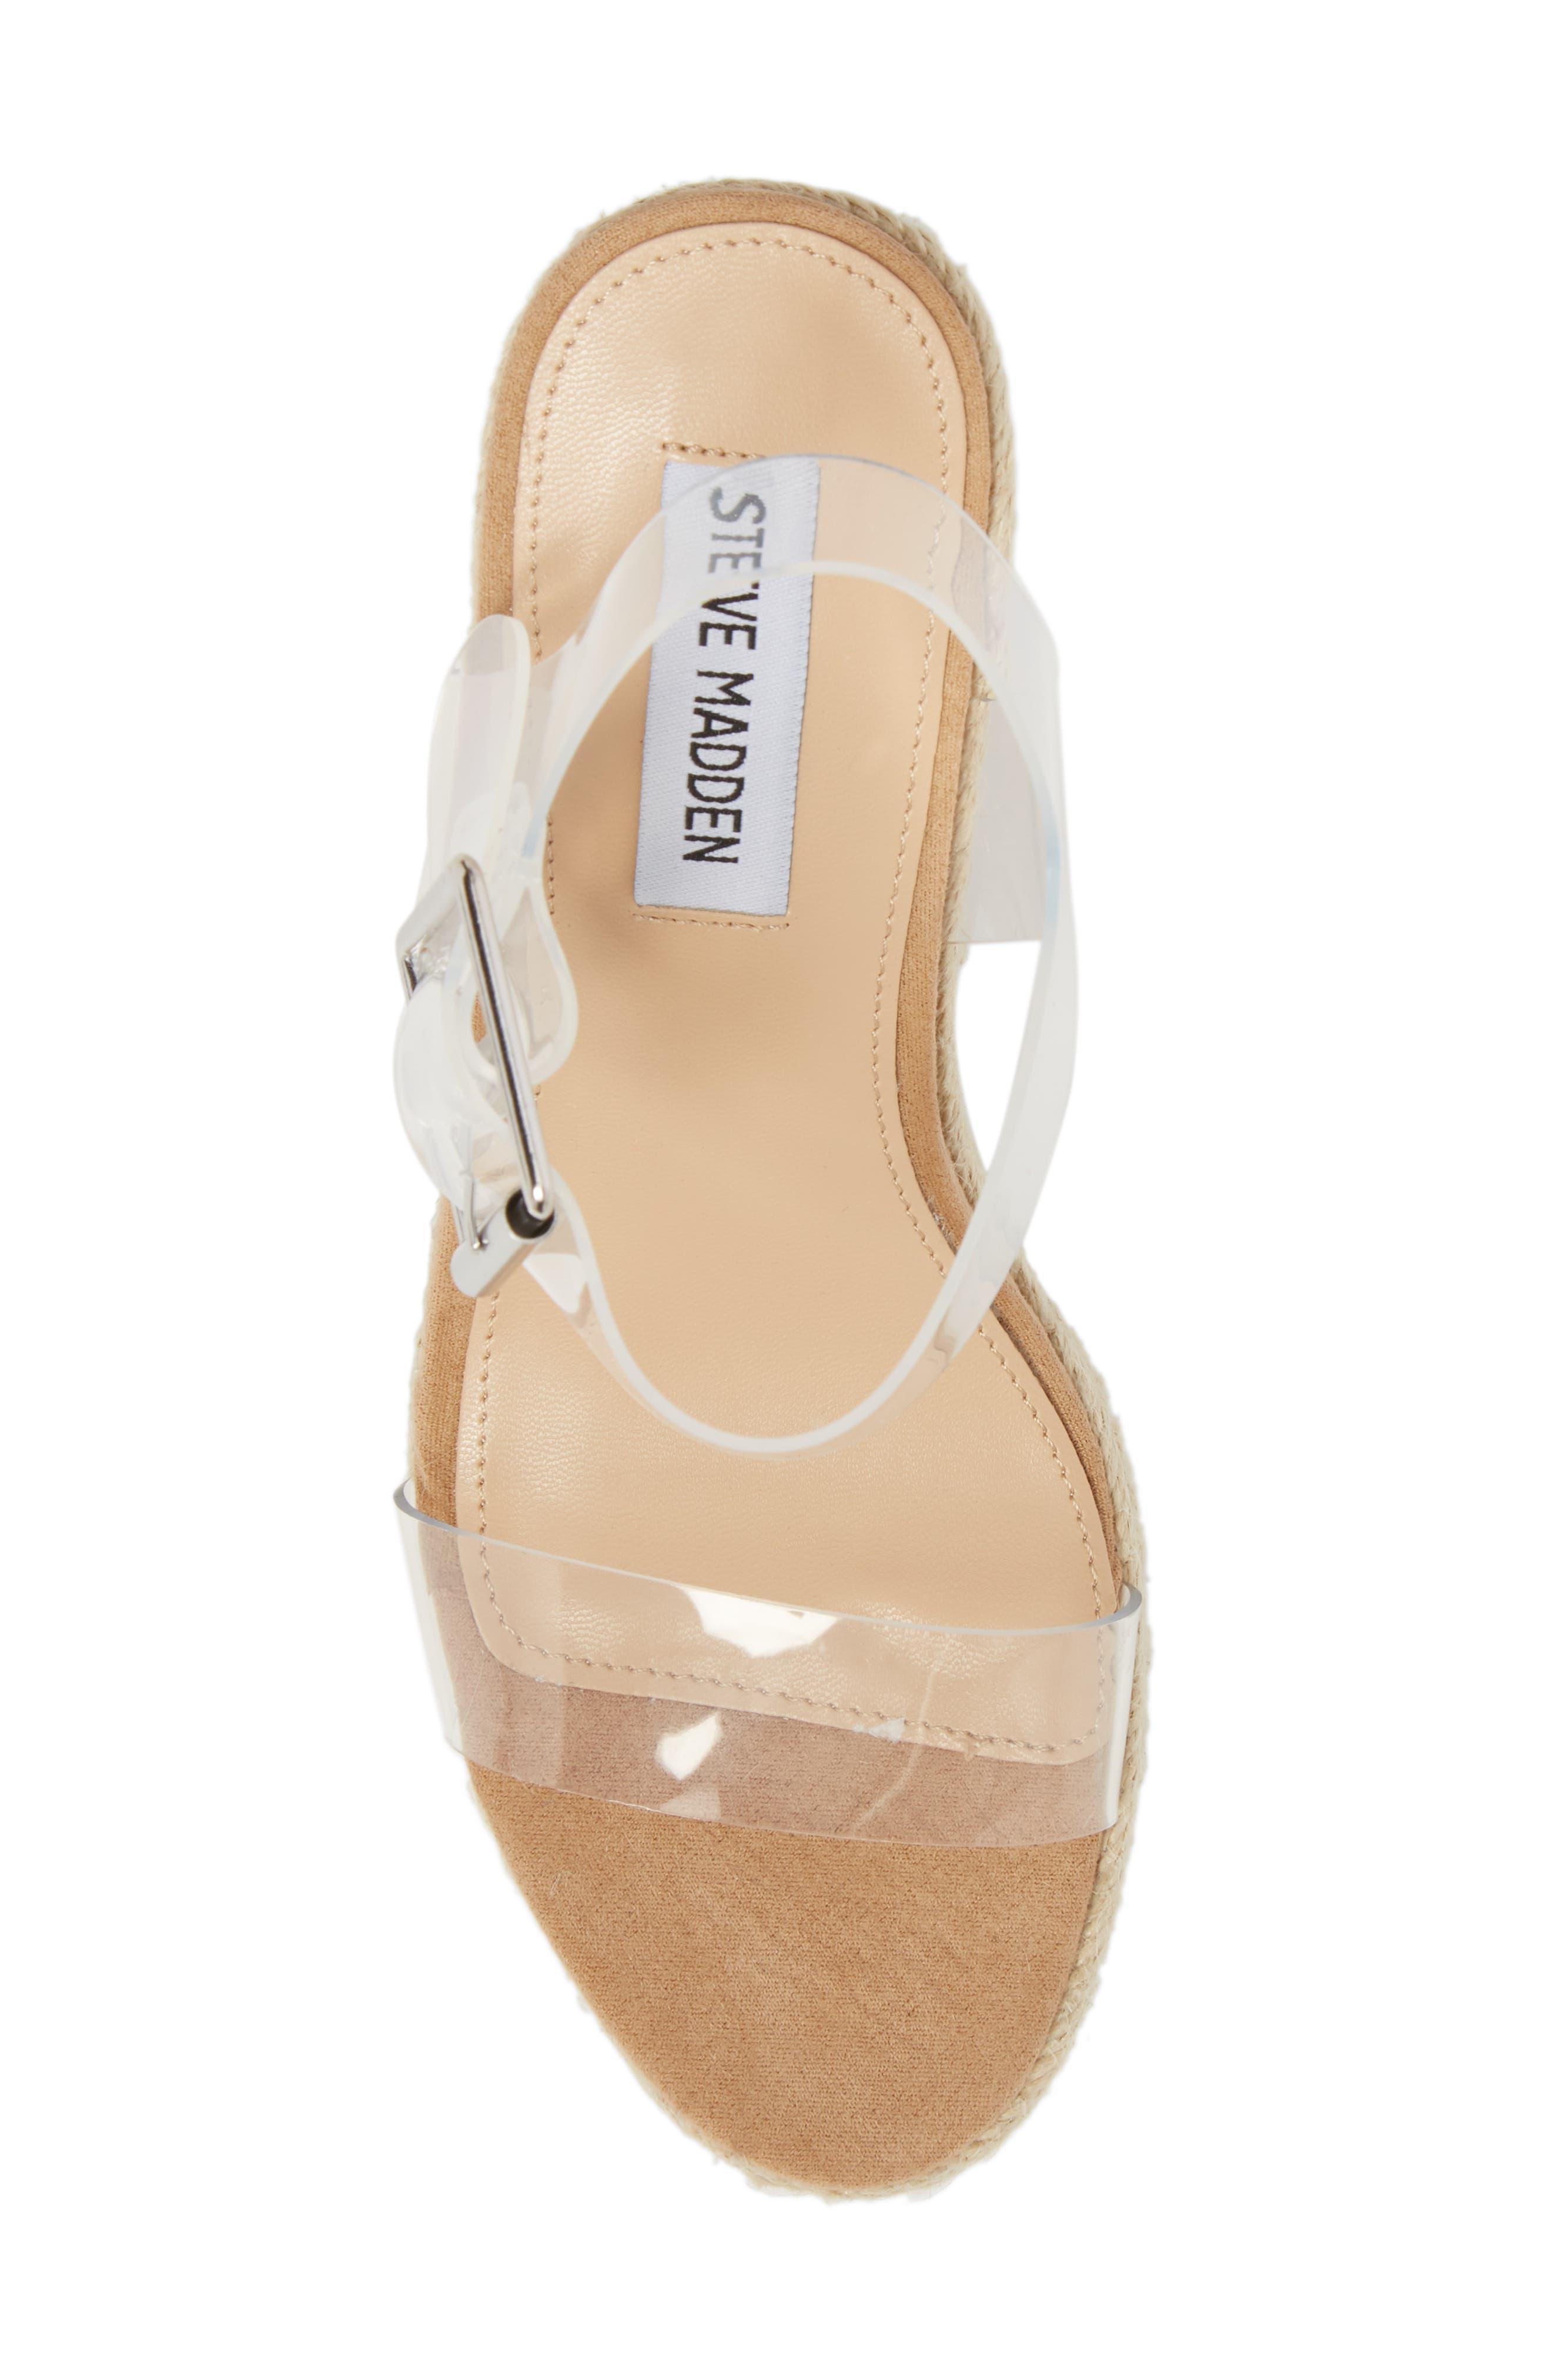 Splash Transparent Strap Wedge Sandal,                             Alternate thumbnail 5, color,                             250